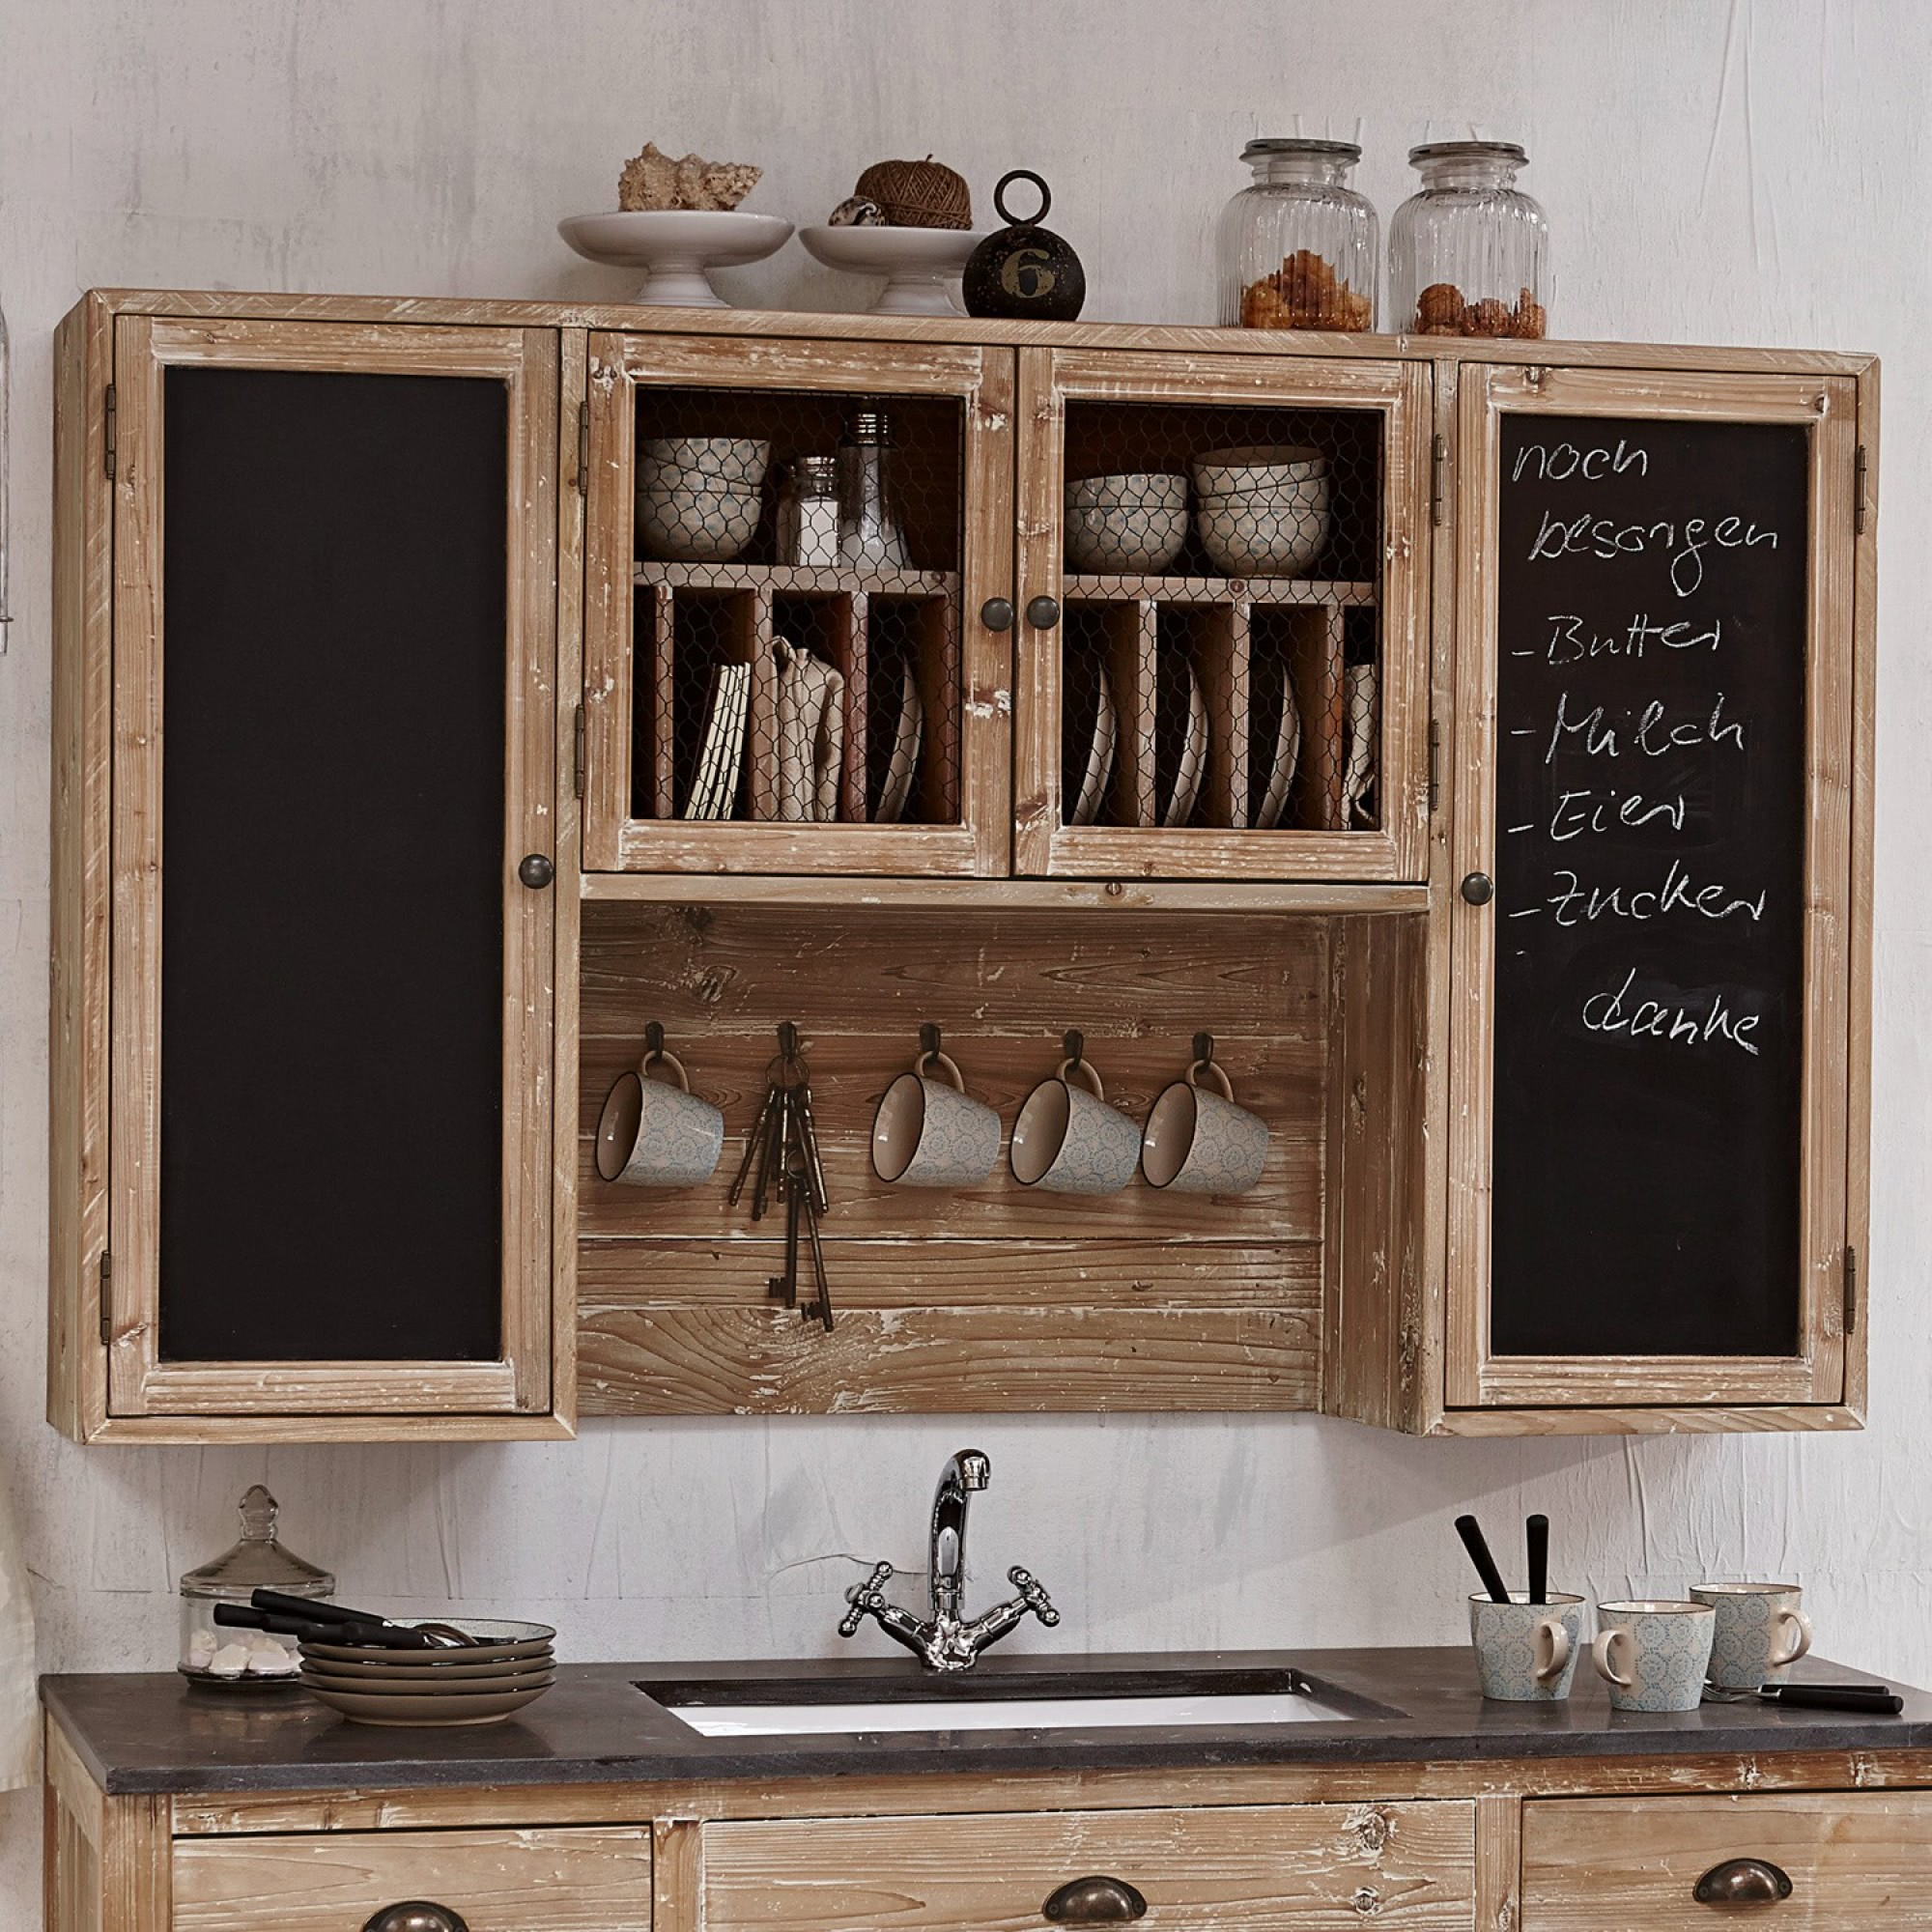 h ngeschrank naturholz bestseller shop f r m bel und einrichtungen. Black Bedroom Furniture Sets. Home Design Ideas